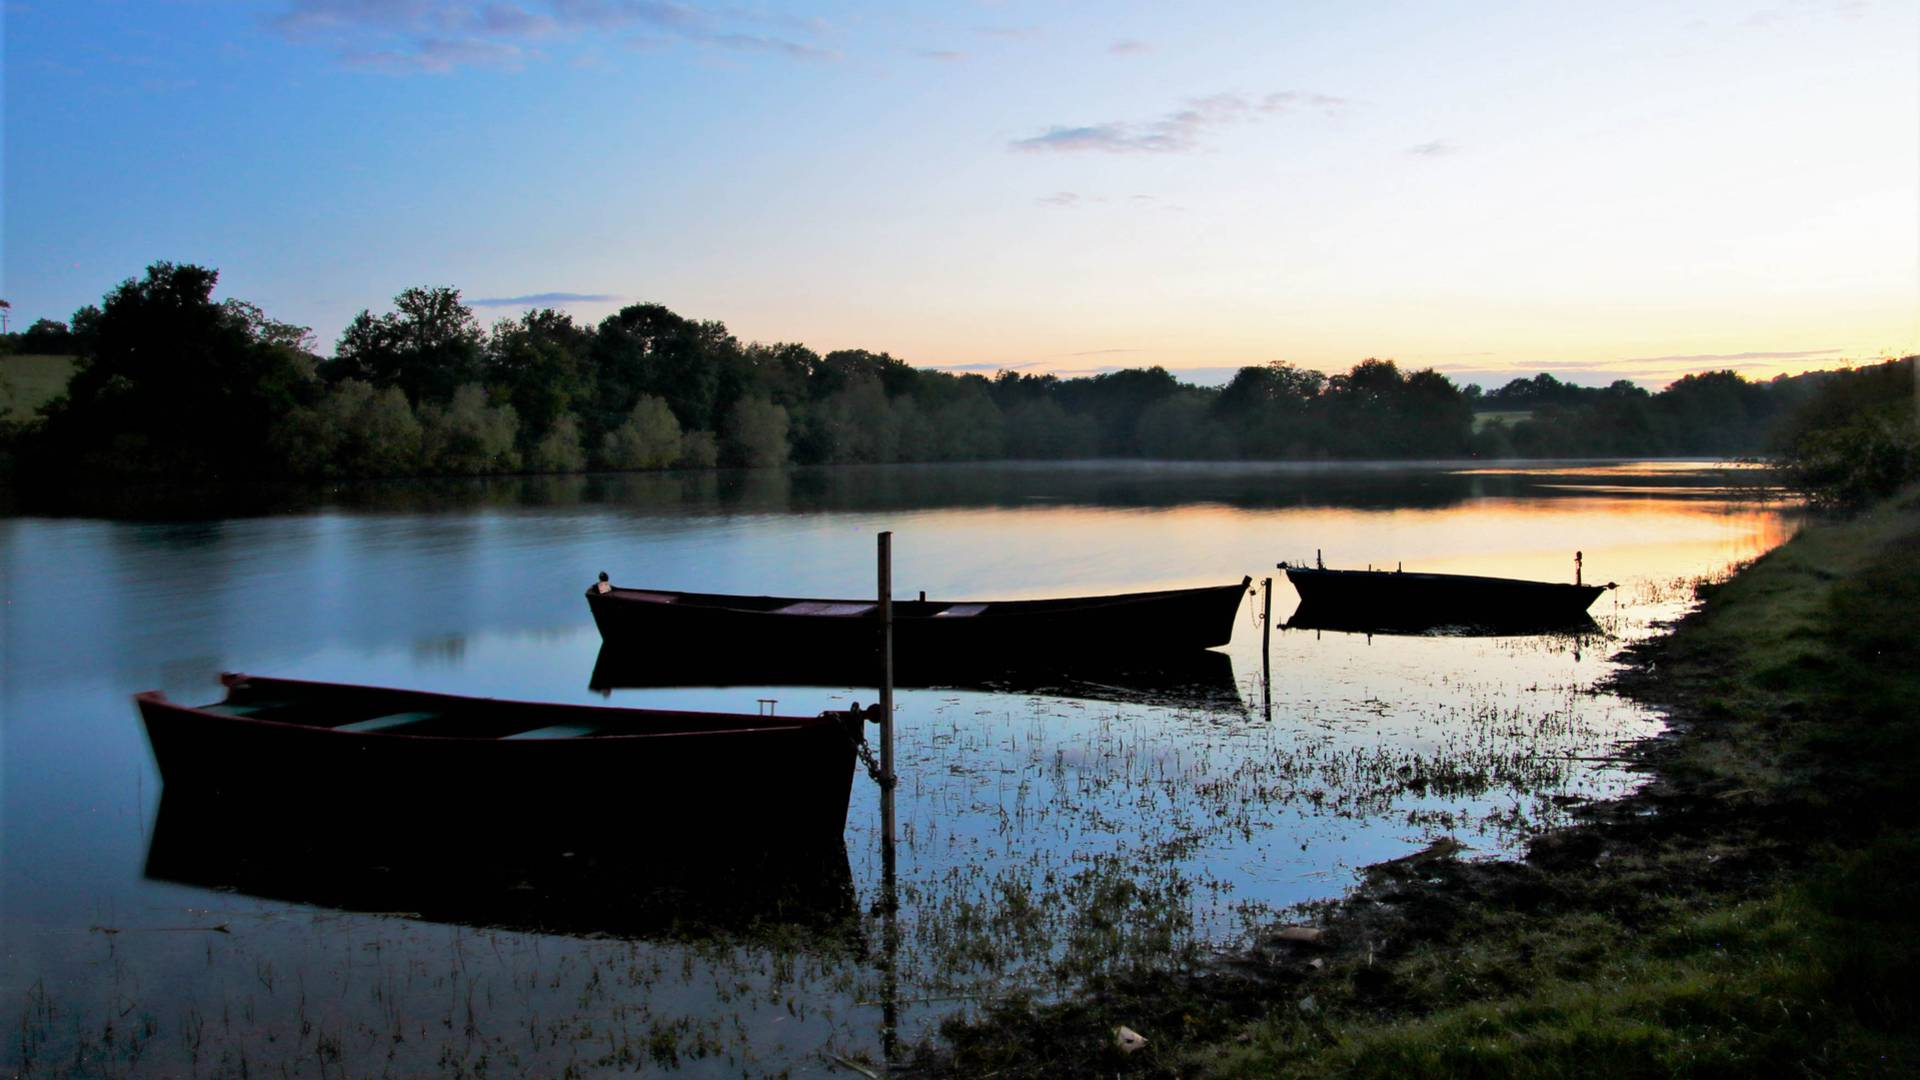 L'étang de Torcy. © Lesley Williamson.